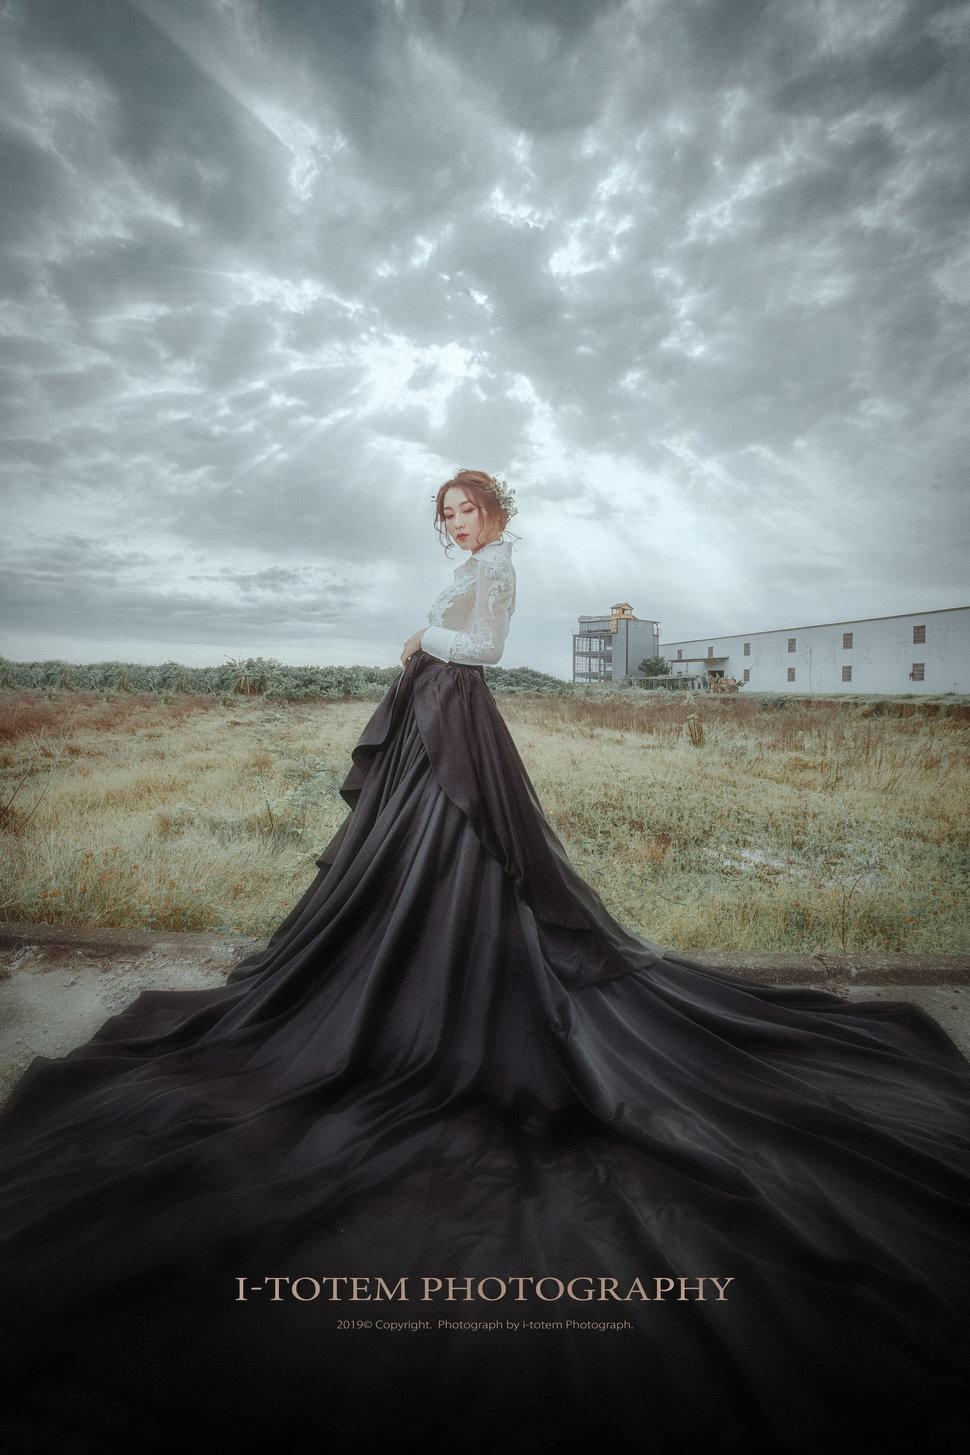 DSC02783 - Zona時尚美甲x新娘秘書整體造型工作室《結婚吧》